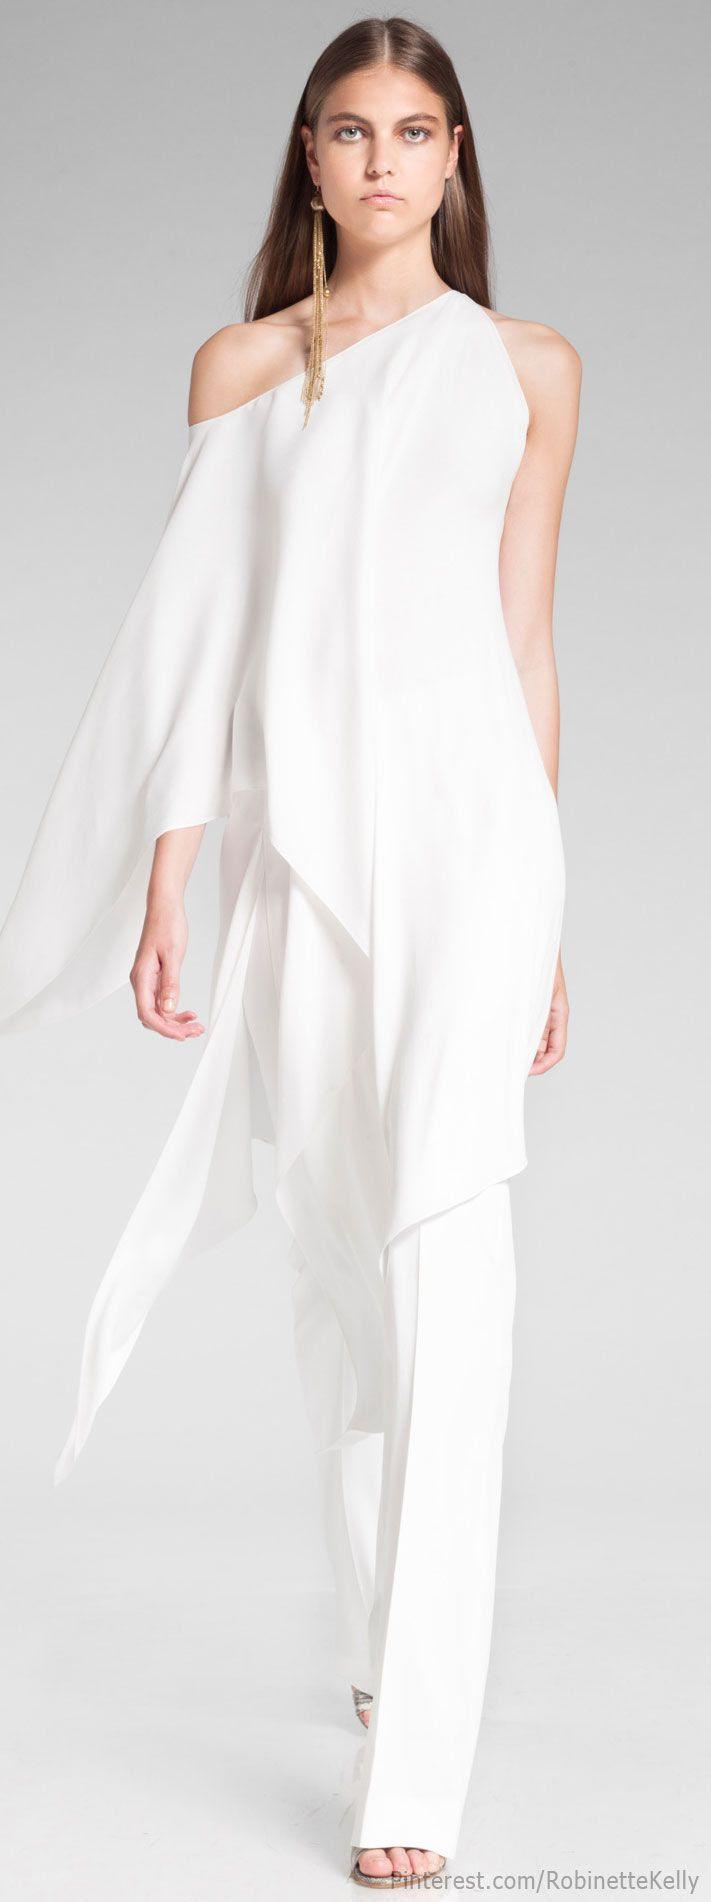 http://www.style.com/fashionshows/complete/slideshow/2014RST-DKARAN/#27